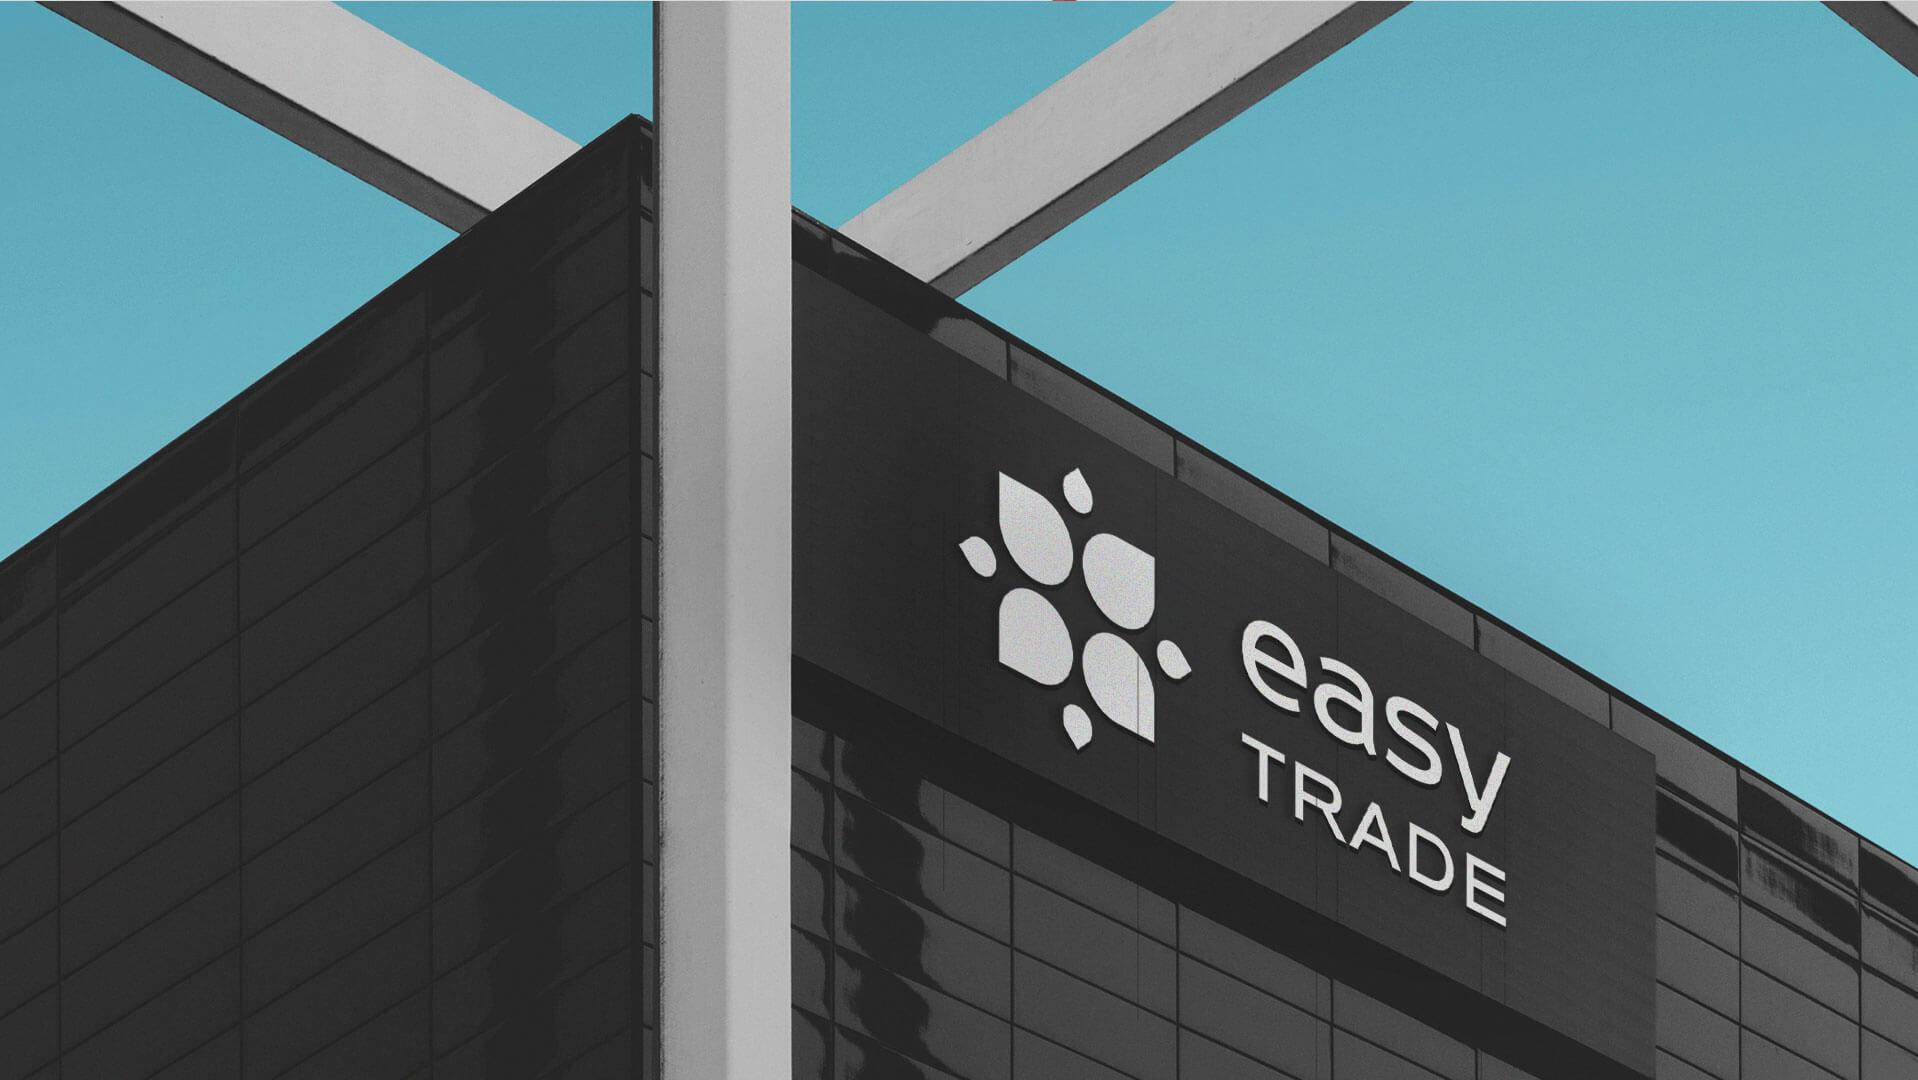 Easy Trade Brand Identity